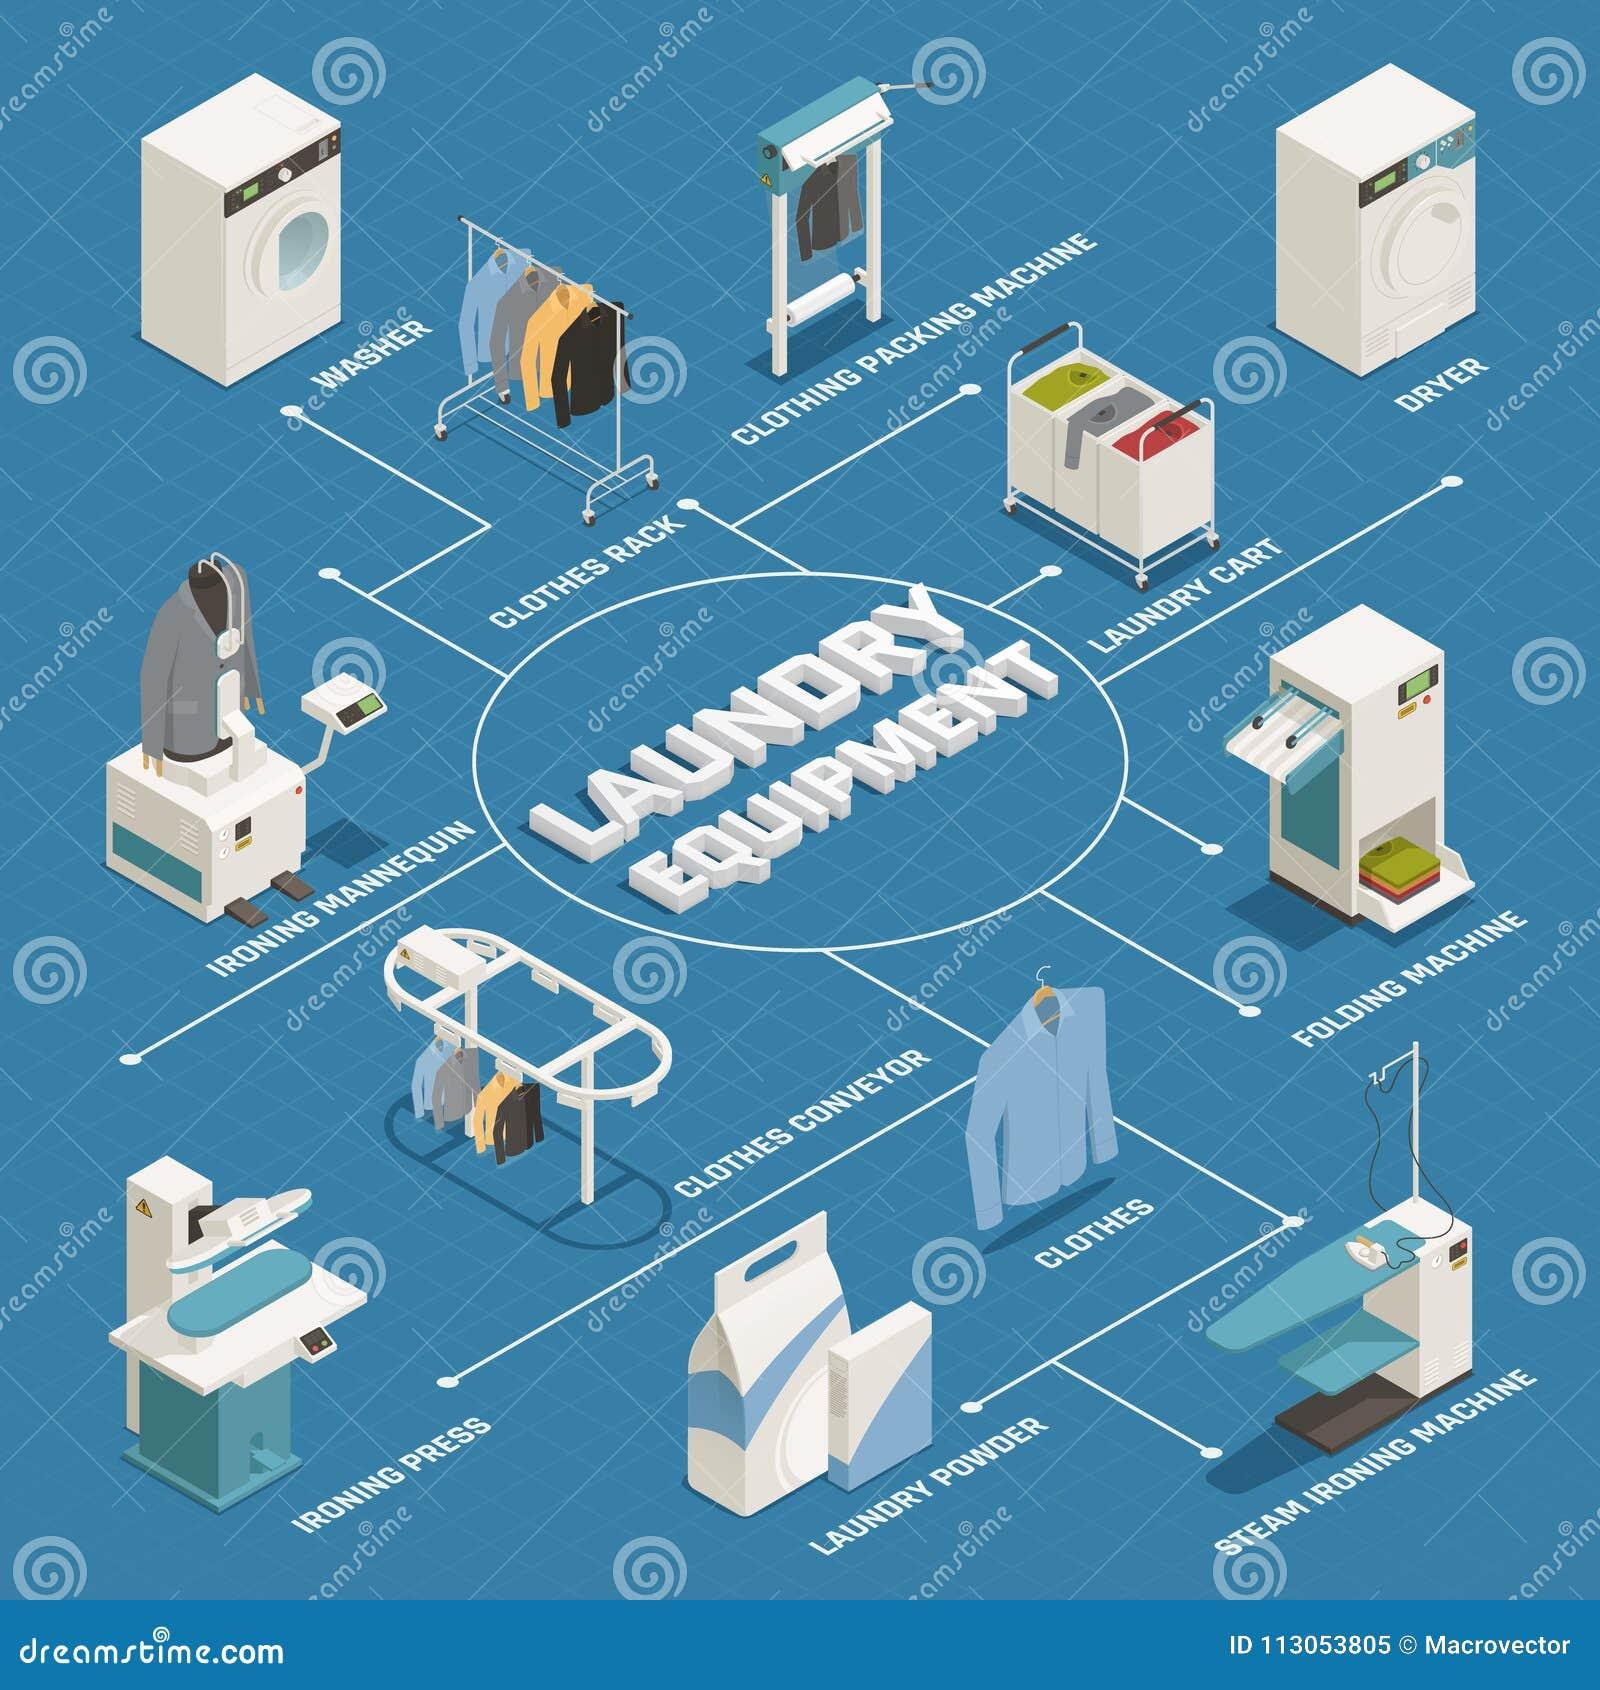 Clothes Rack Circuit Diagram - Block And Schematic Diagrams •